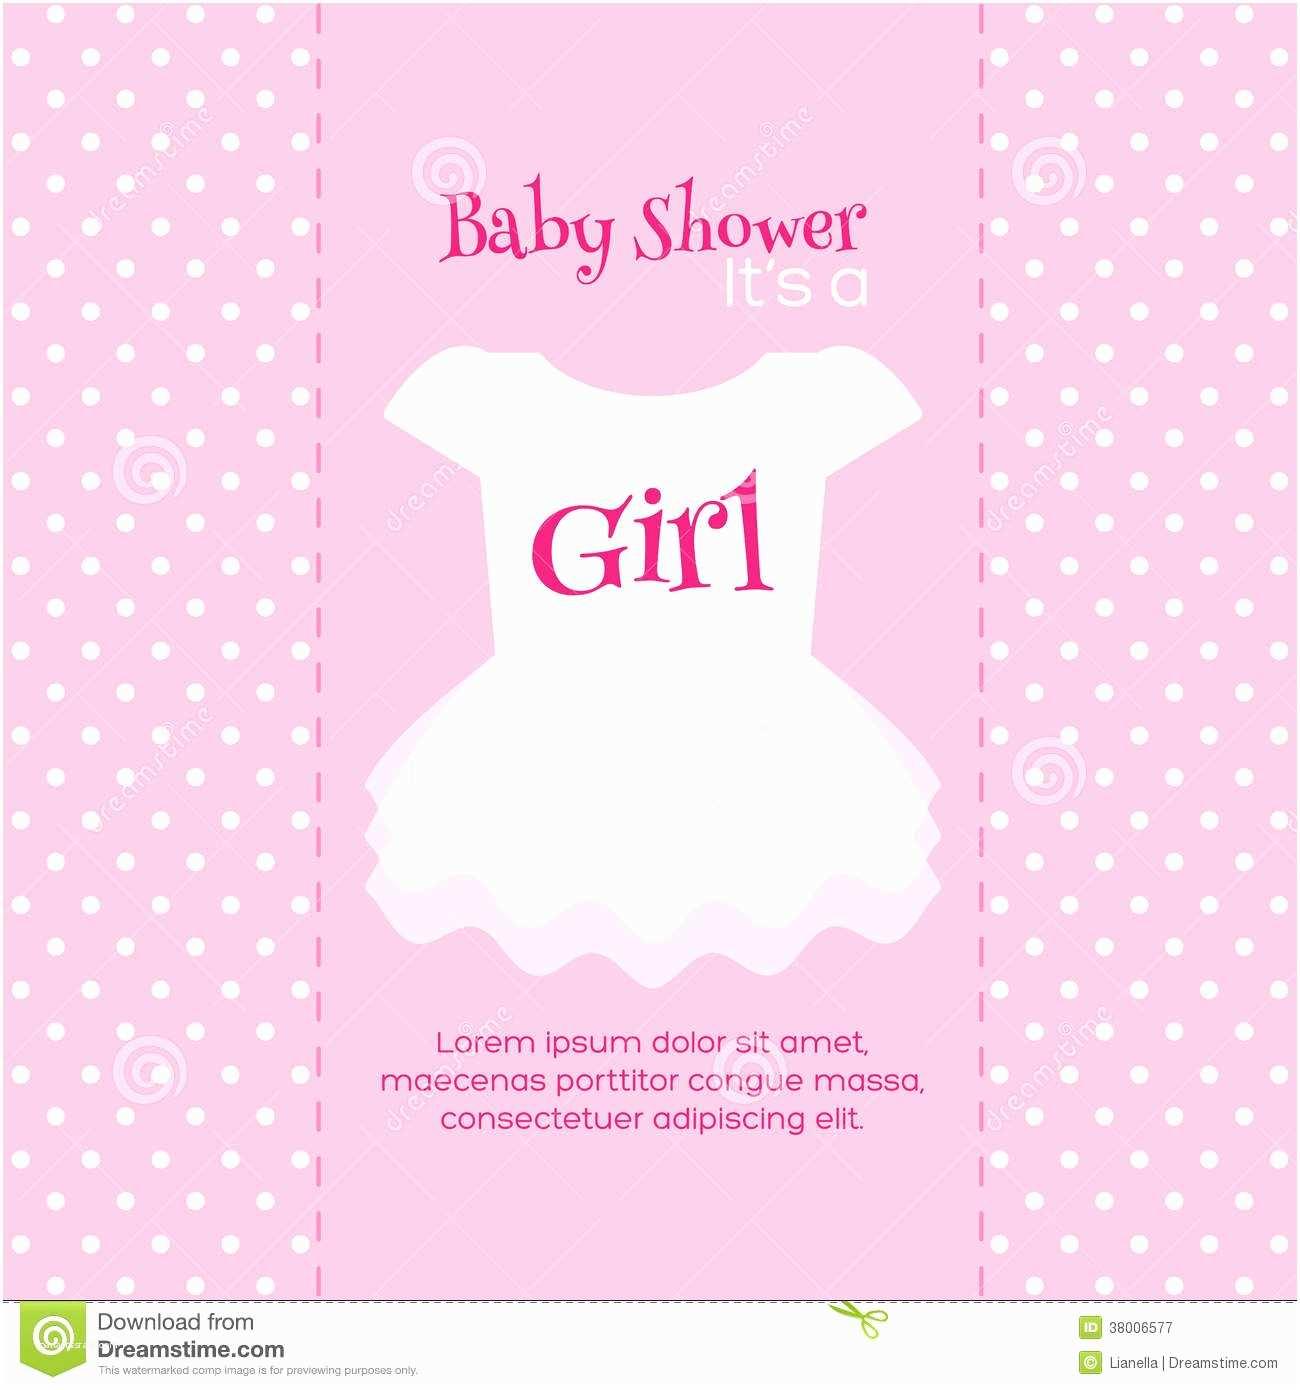 Baby Shower Invitation for Girl Baby Girl Baby Shower Invitation Templates